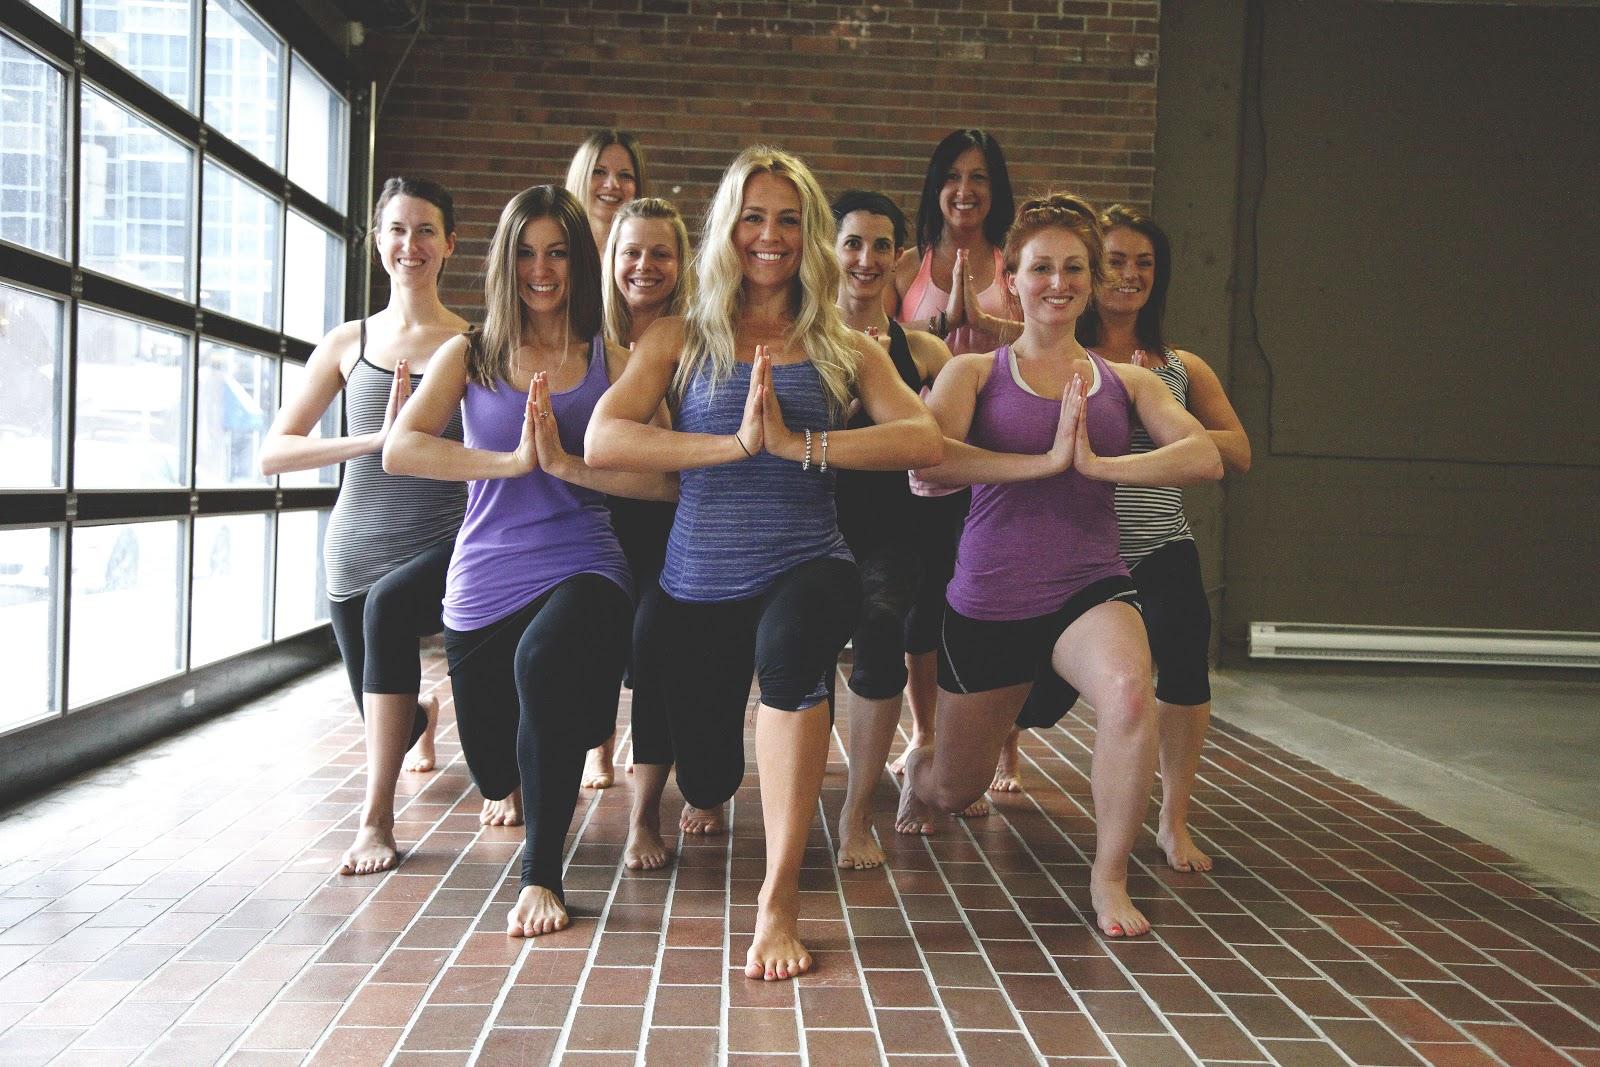 Jana Webb, Yoga With Jana, Joga, Yoga for Jocks, Prairie Yogi Magazine, Monique Pantel, Rachelle Taylor, Prairie Yoga Magazine, Yoga, Blonde Yoga babe, Best Yoga Website